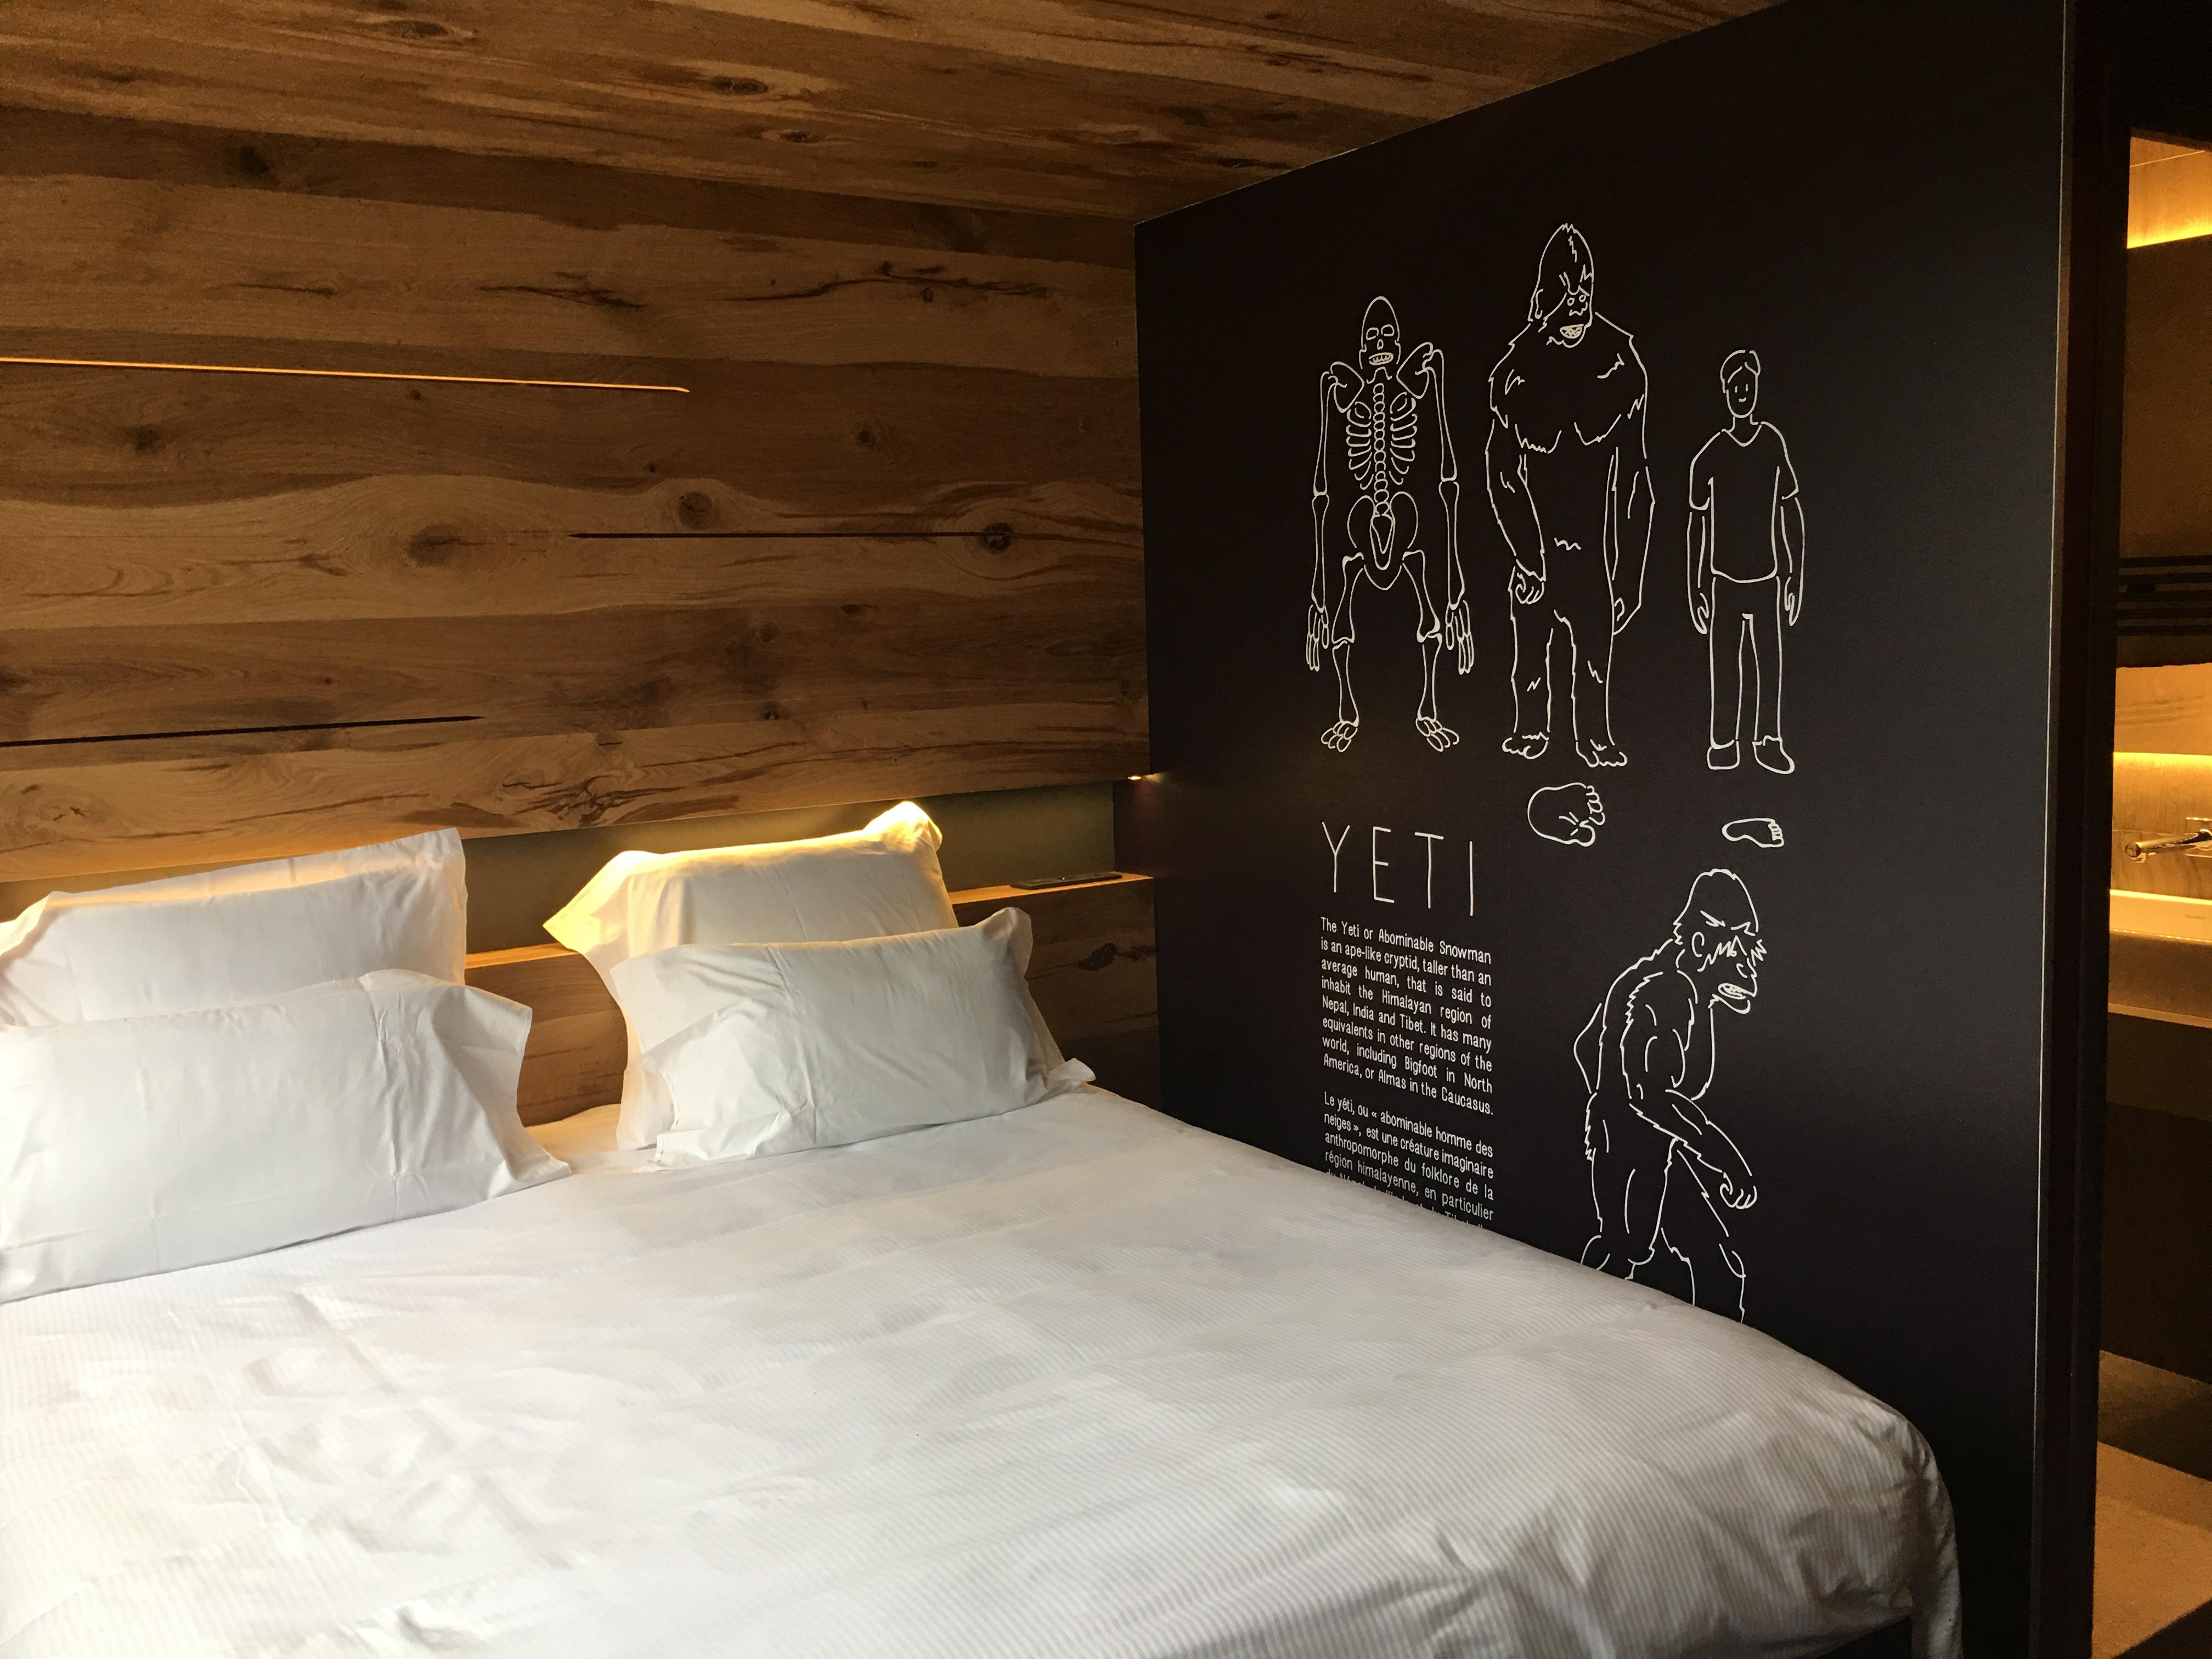 alpina eclectic hotel in chamonix mont blanc french alps savoie mont blanc